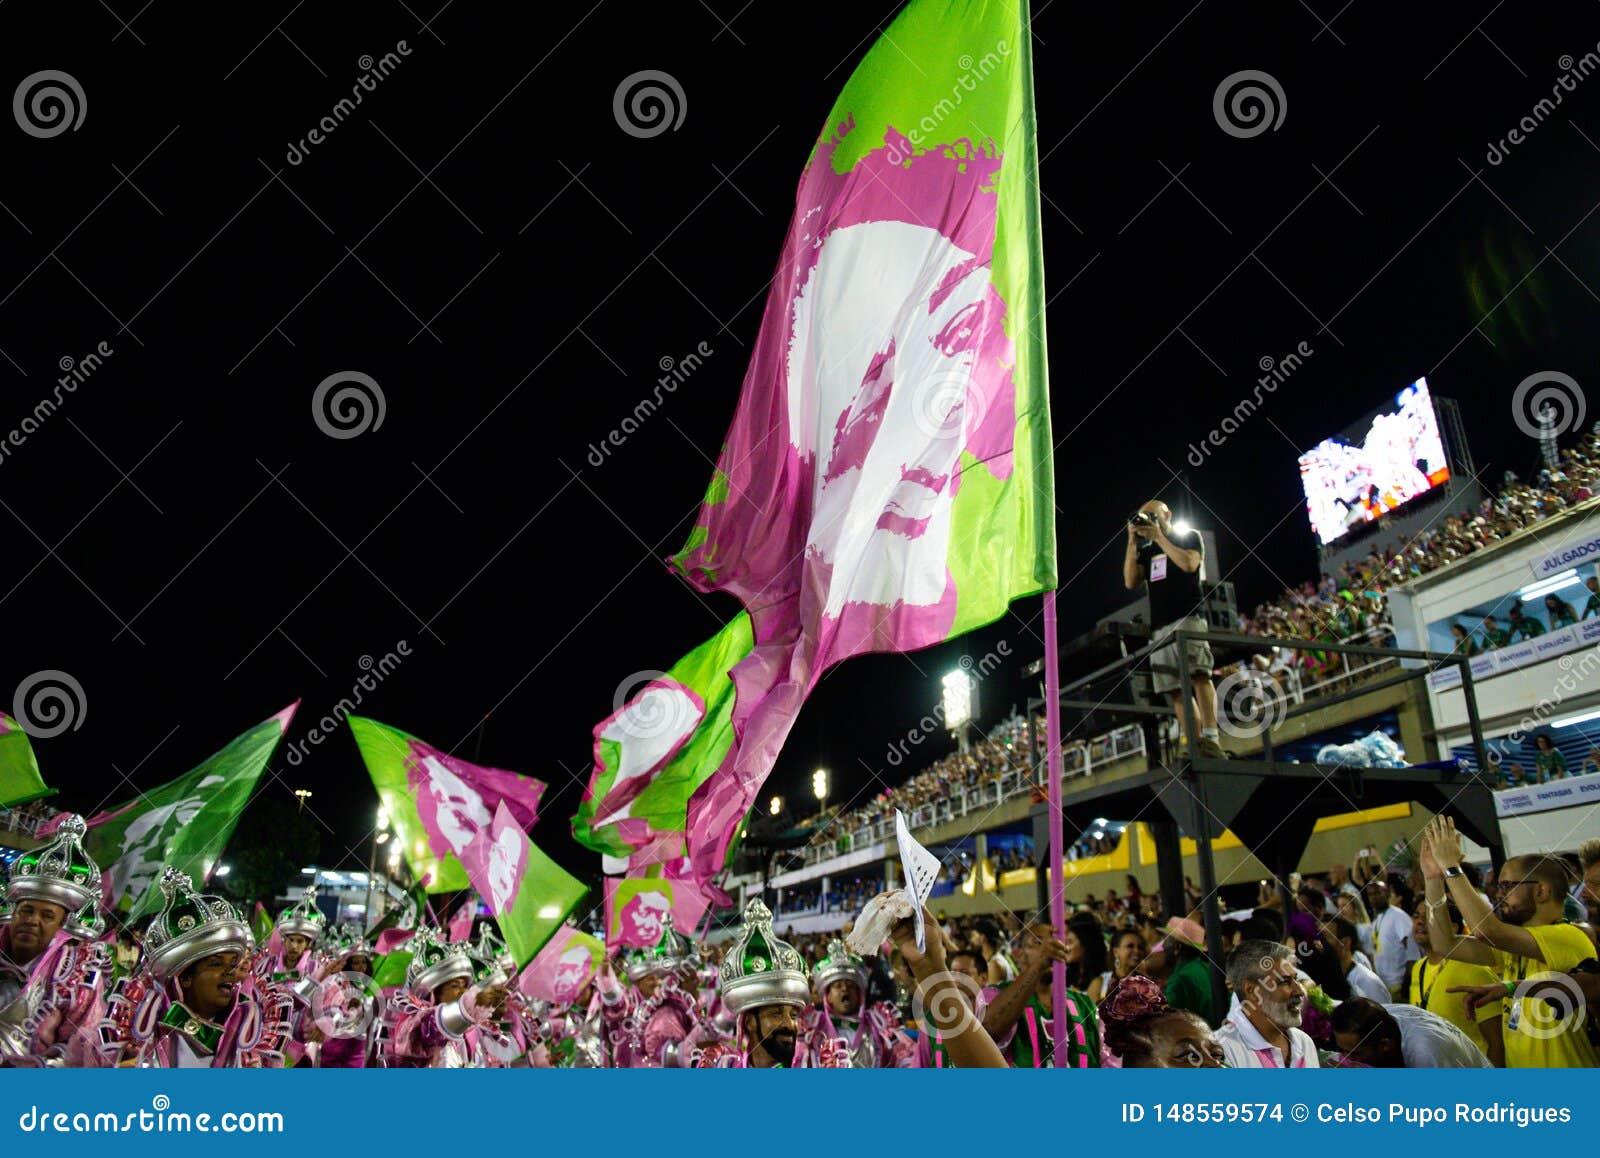 Carnival 2019 - Mangueira